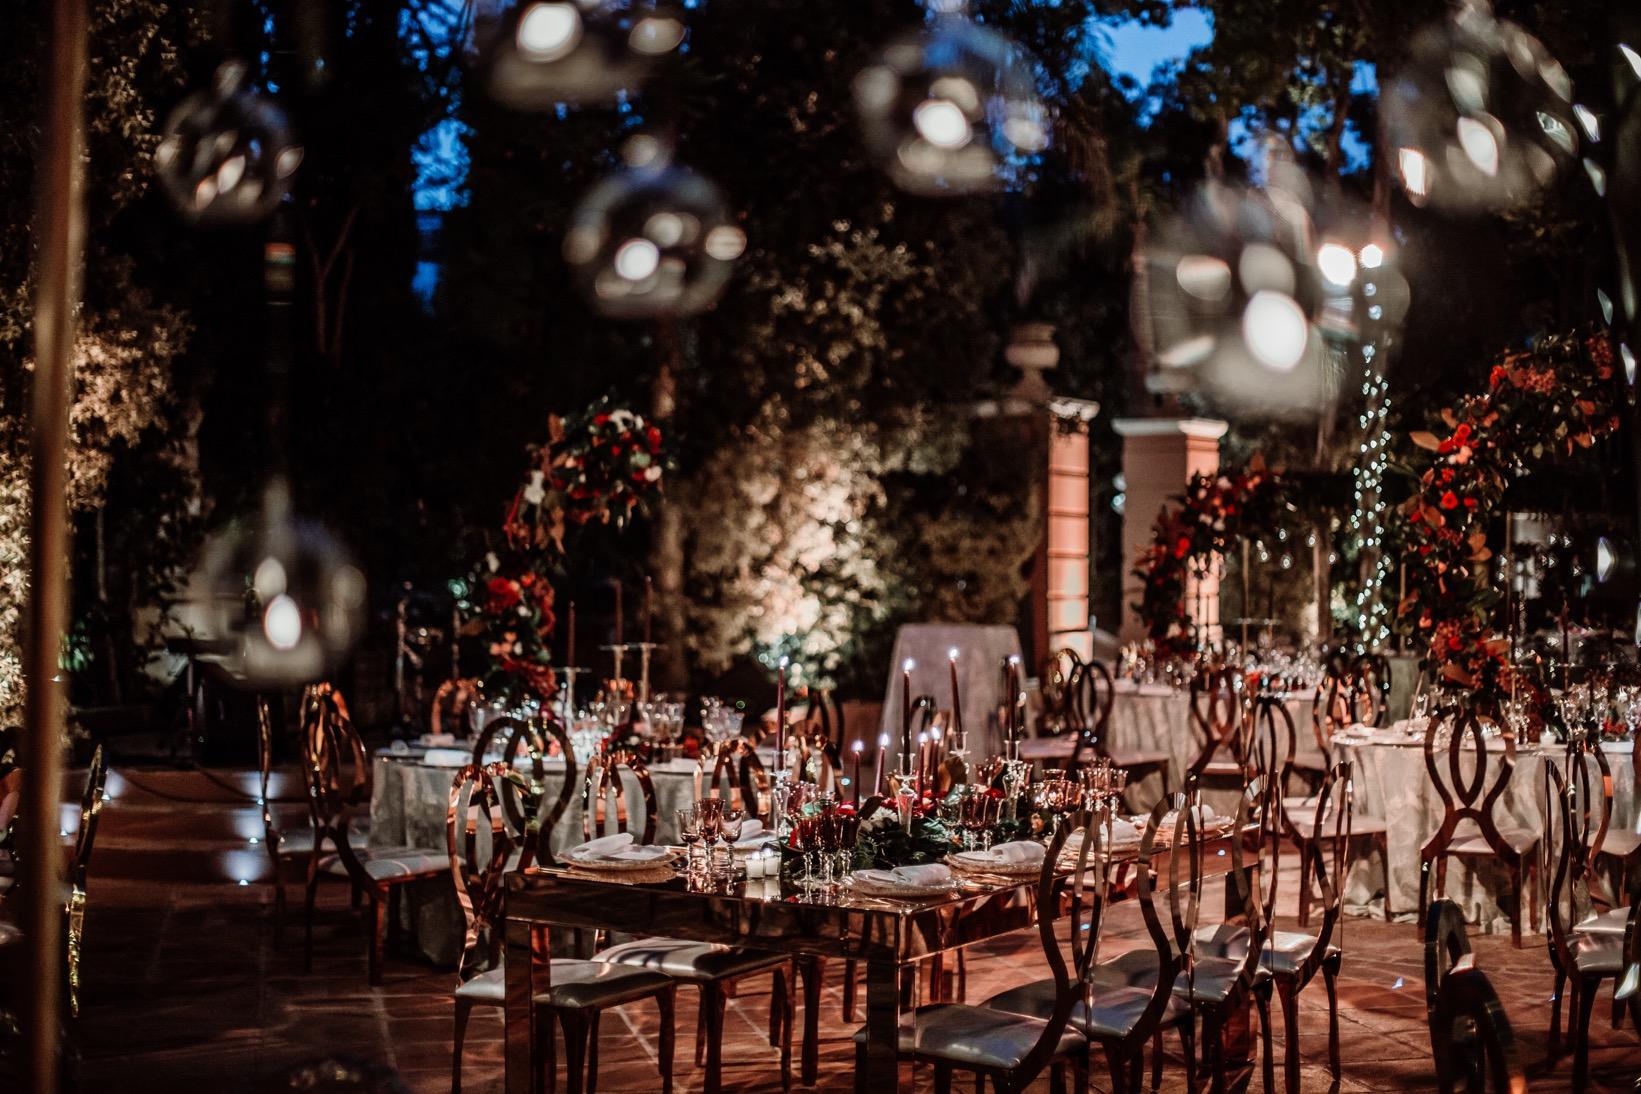 Si-Quiero-Wedding-Planner-By-Sira-Antequera-Bodas-Málaga-Marbella-Miami-00001